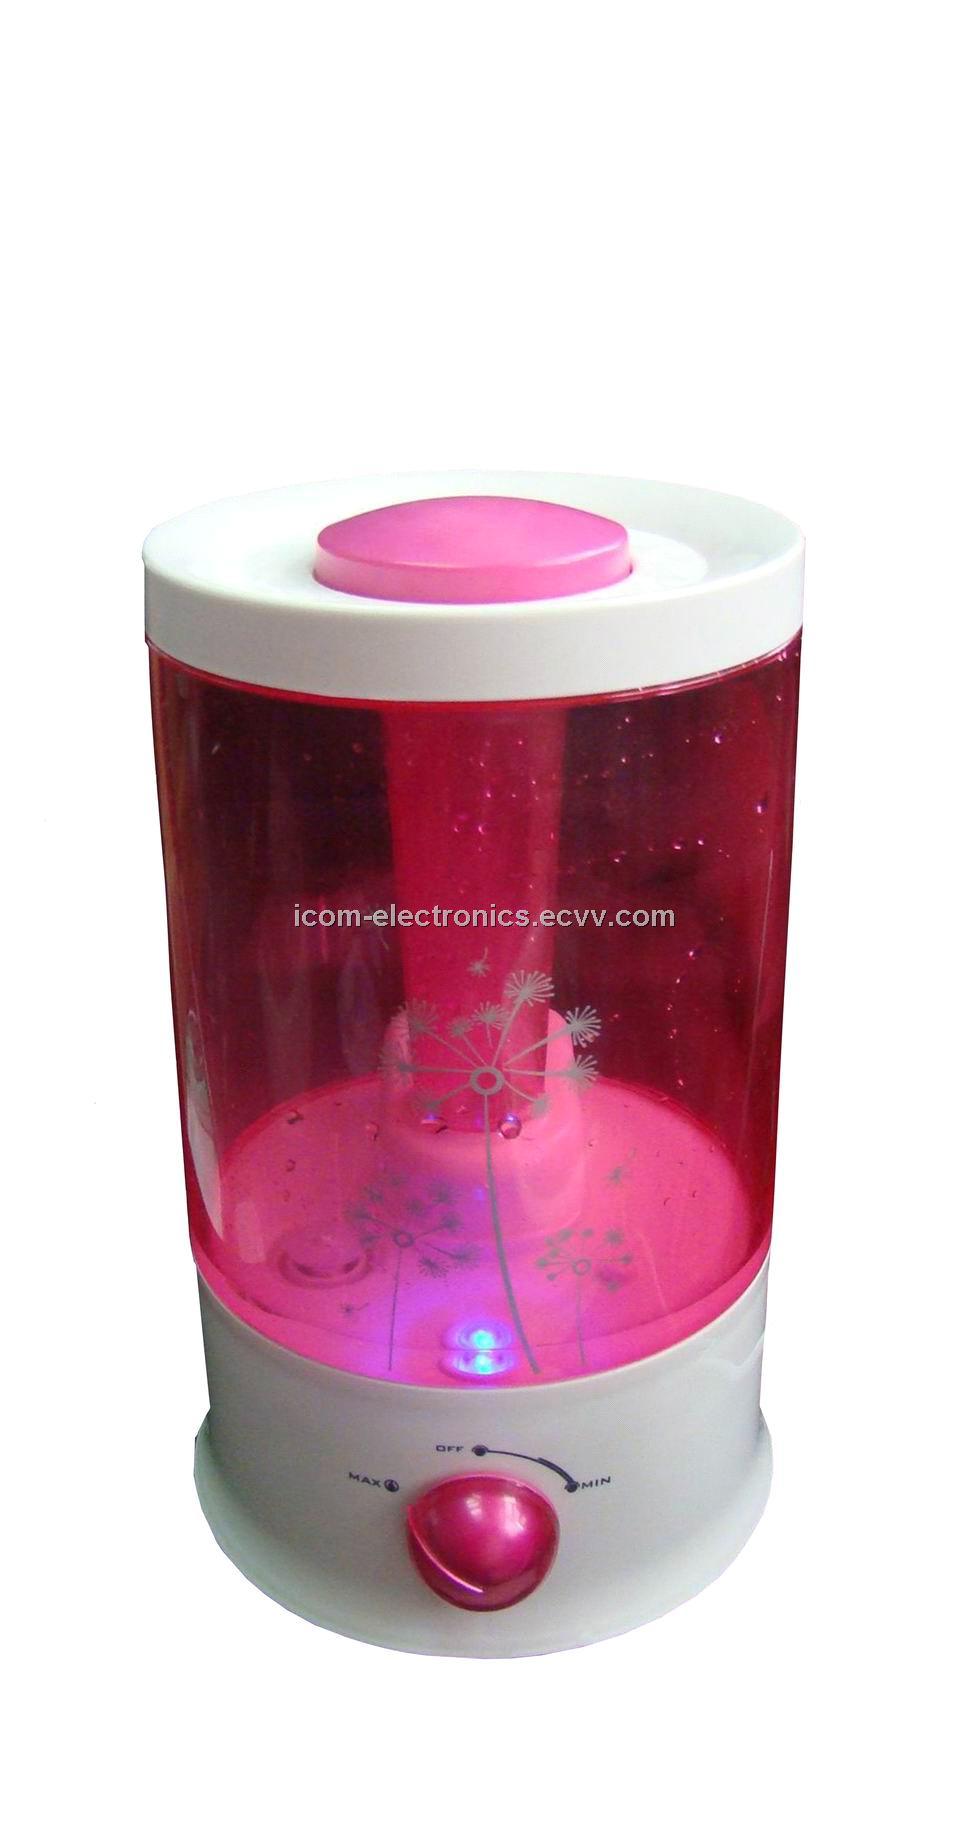 air humidifier ocean air humidifier midea dehumidifier manual wdk30ae7n midea dehumidifier wdk50ae6n manual